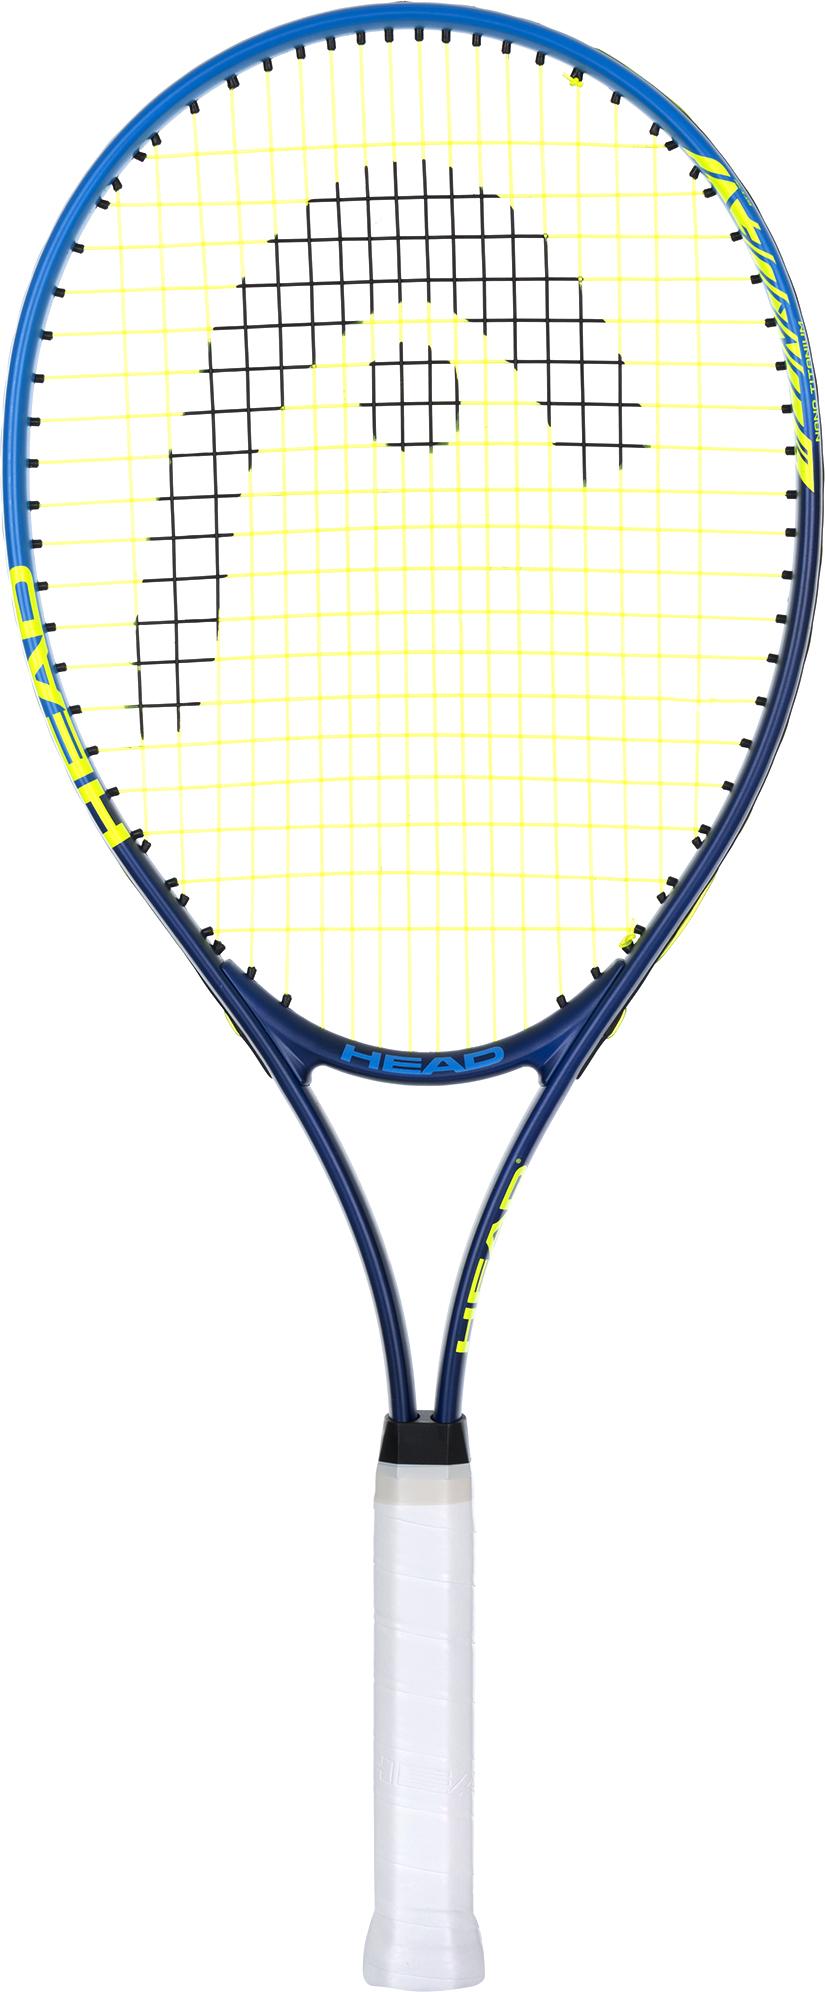 Head Ракетка для большого тенниса Head Conquest head ракетка для большого тенниса детская head novak 19 размер без размера